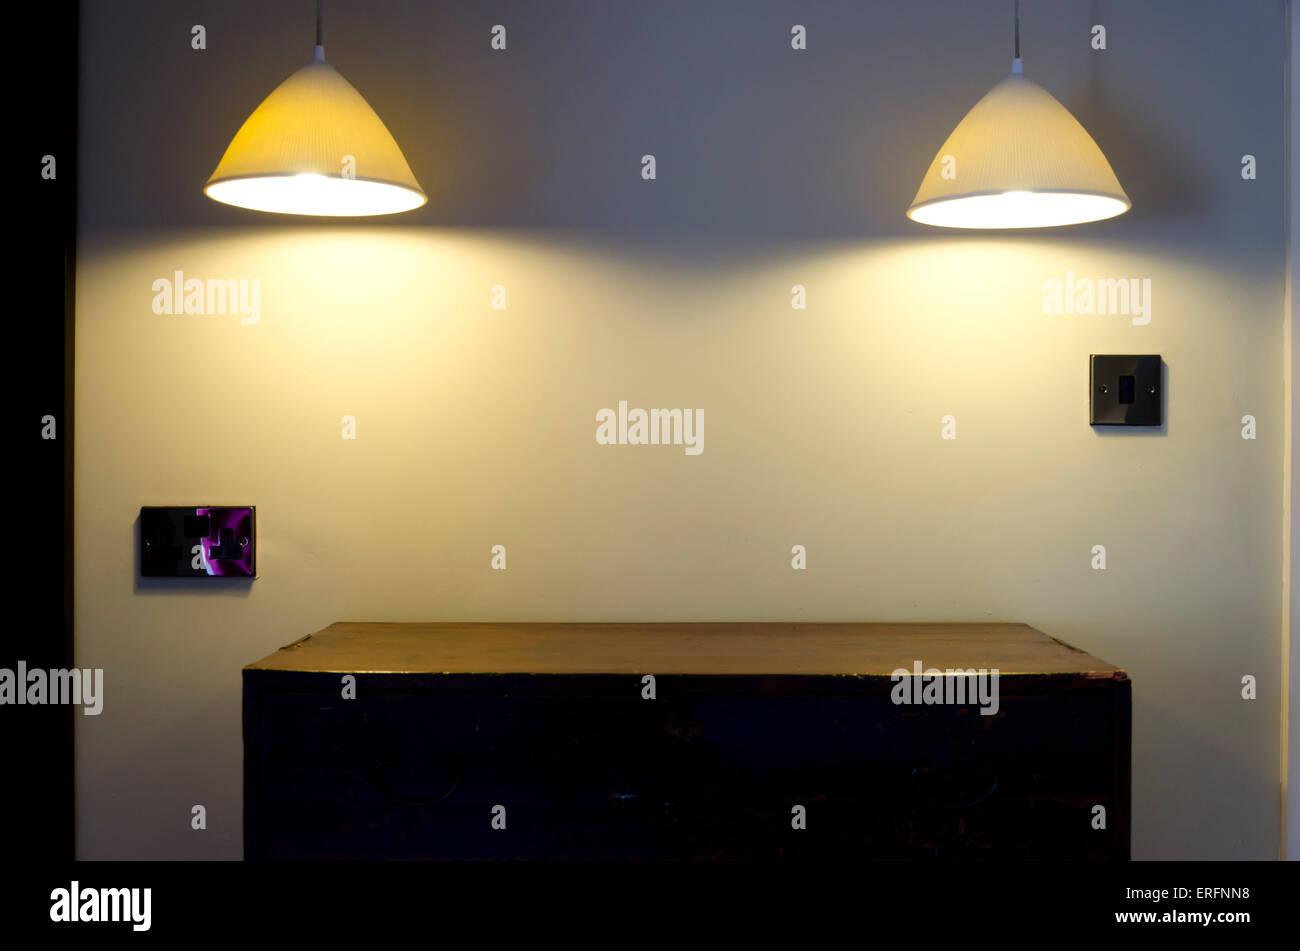 Lamps illuminating empty sideboard. - Stock Image